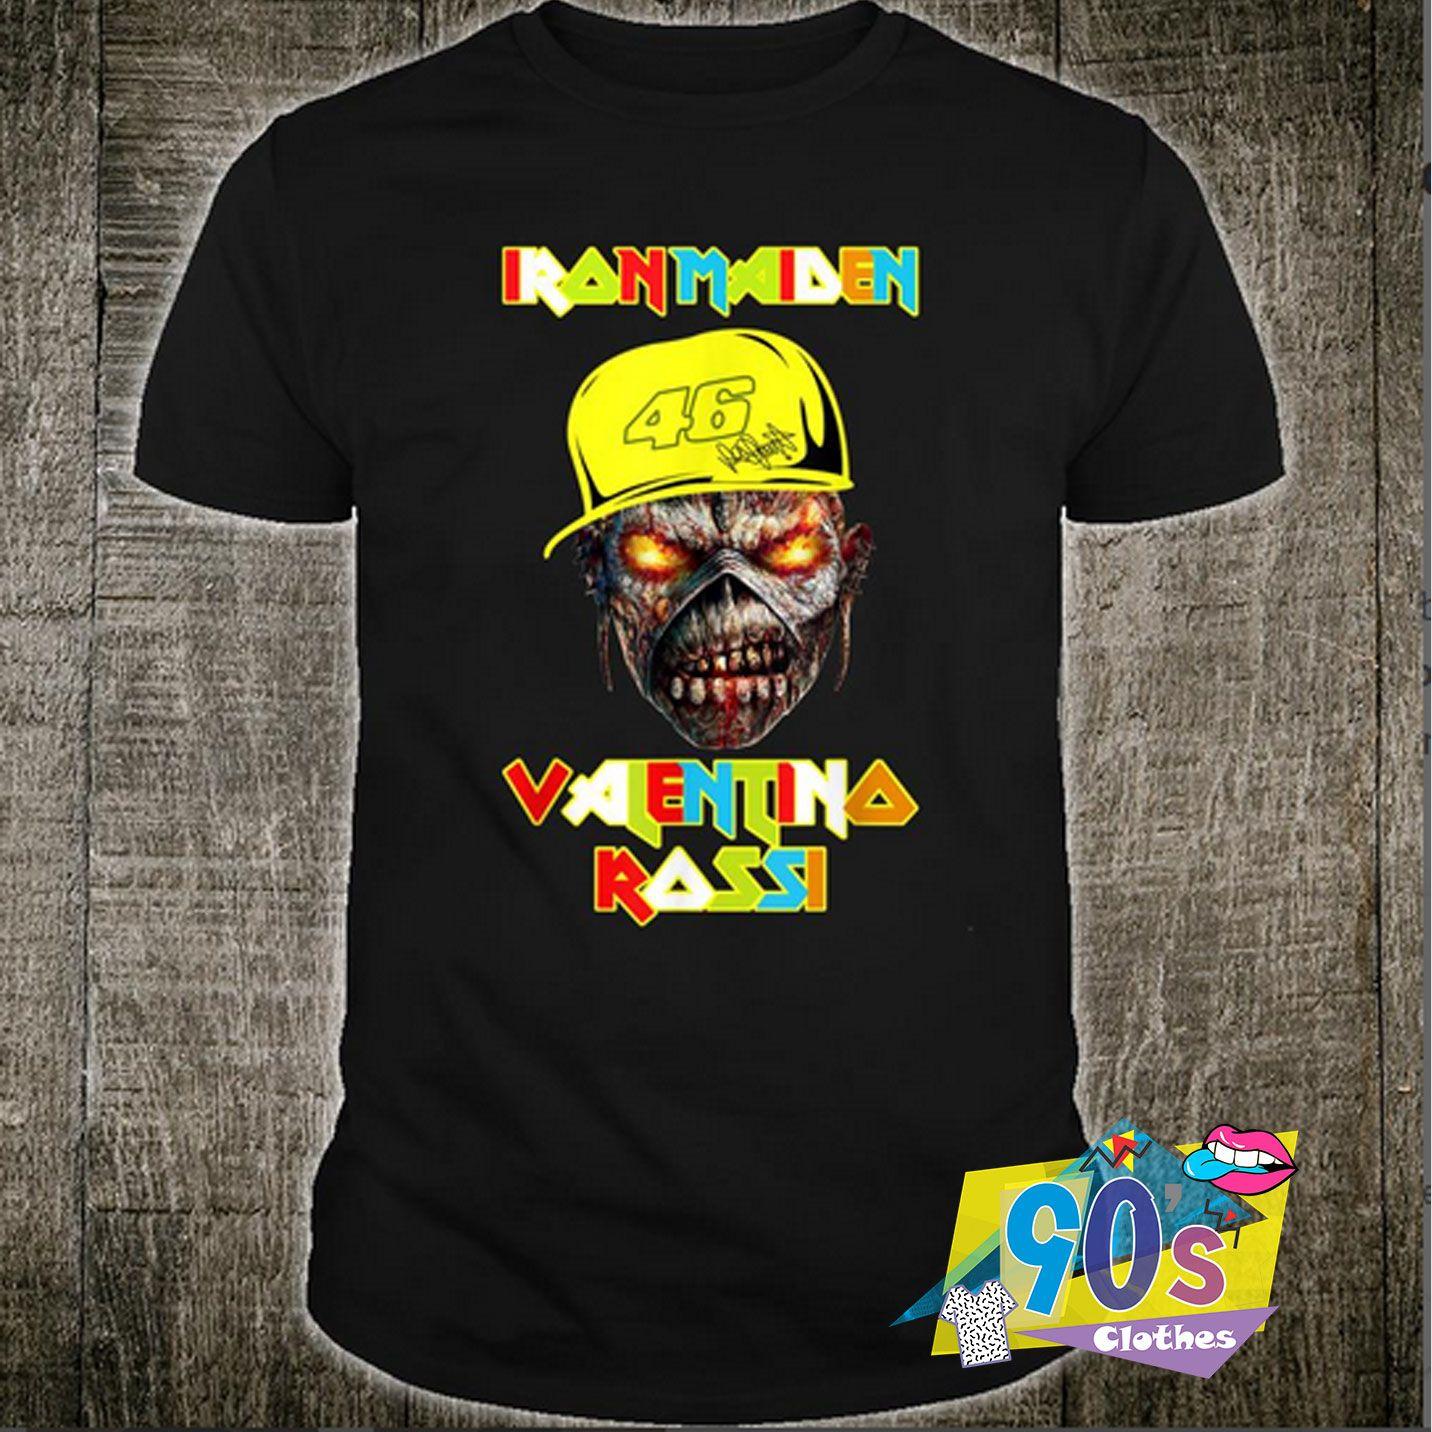 Iron Maiden Valentino Rossi Funny T Shirt #decadedayoutfits